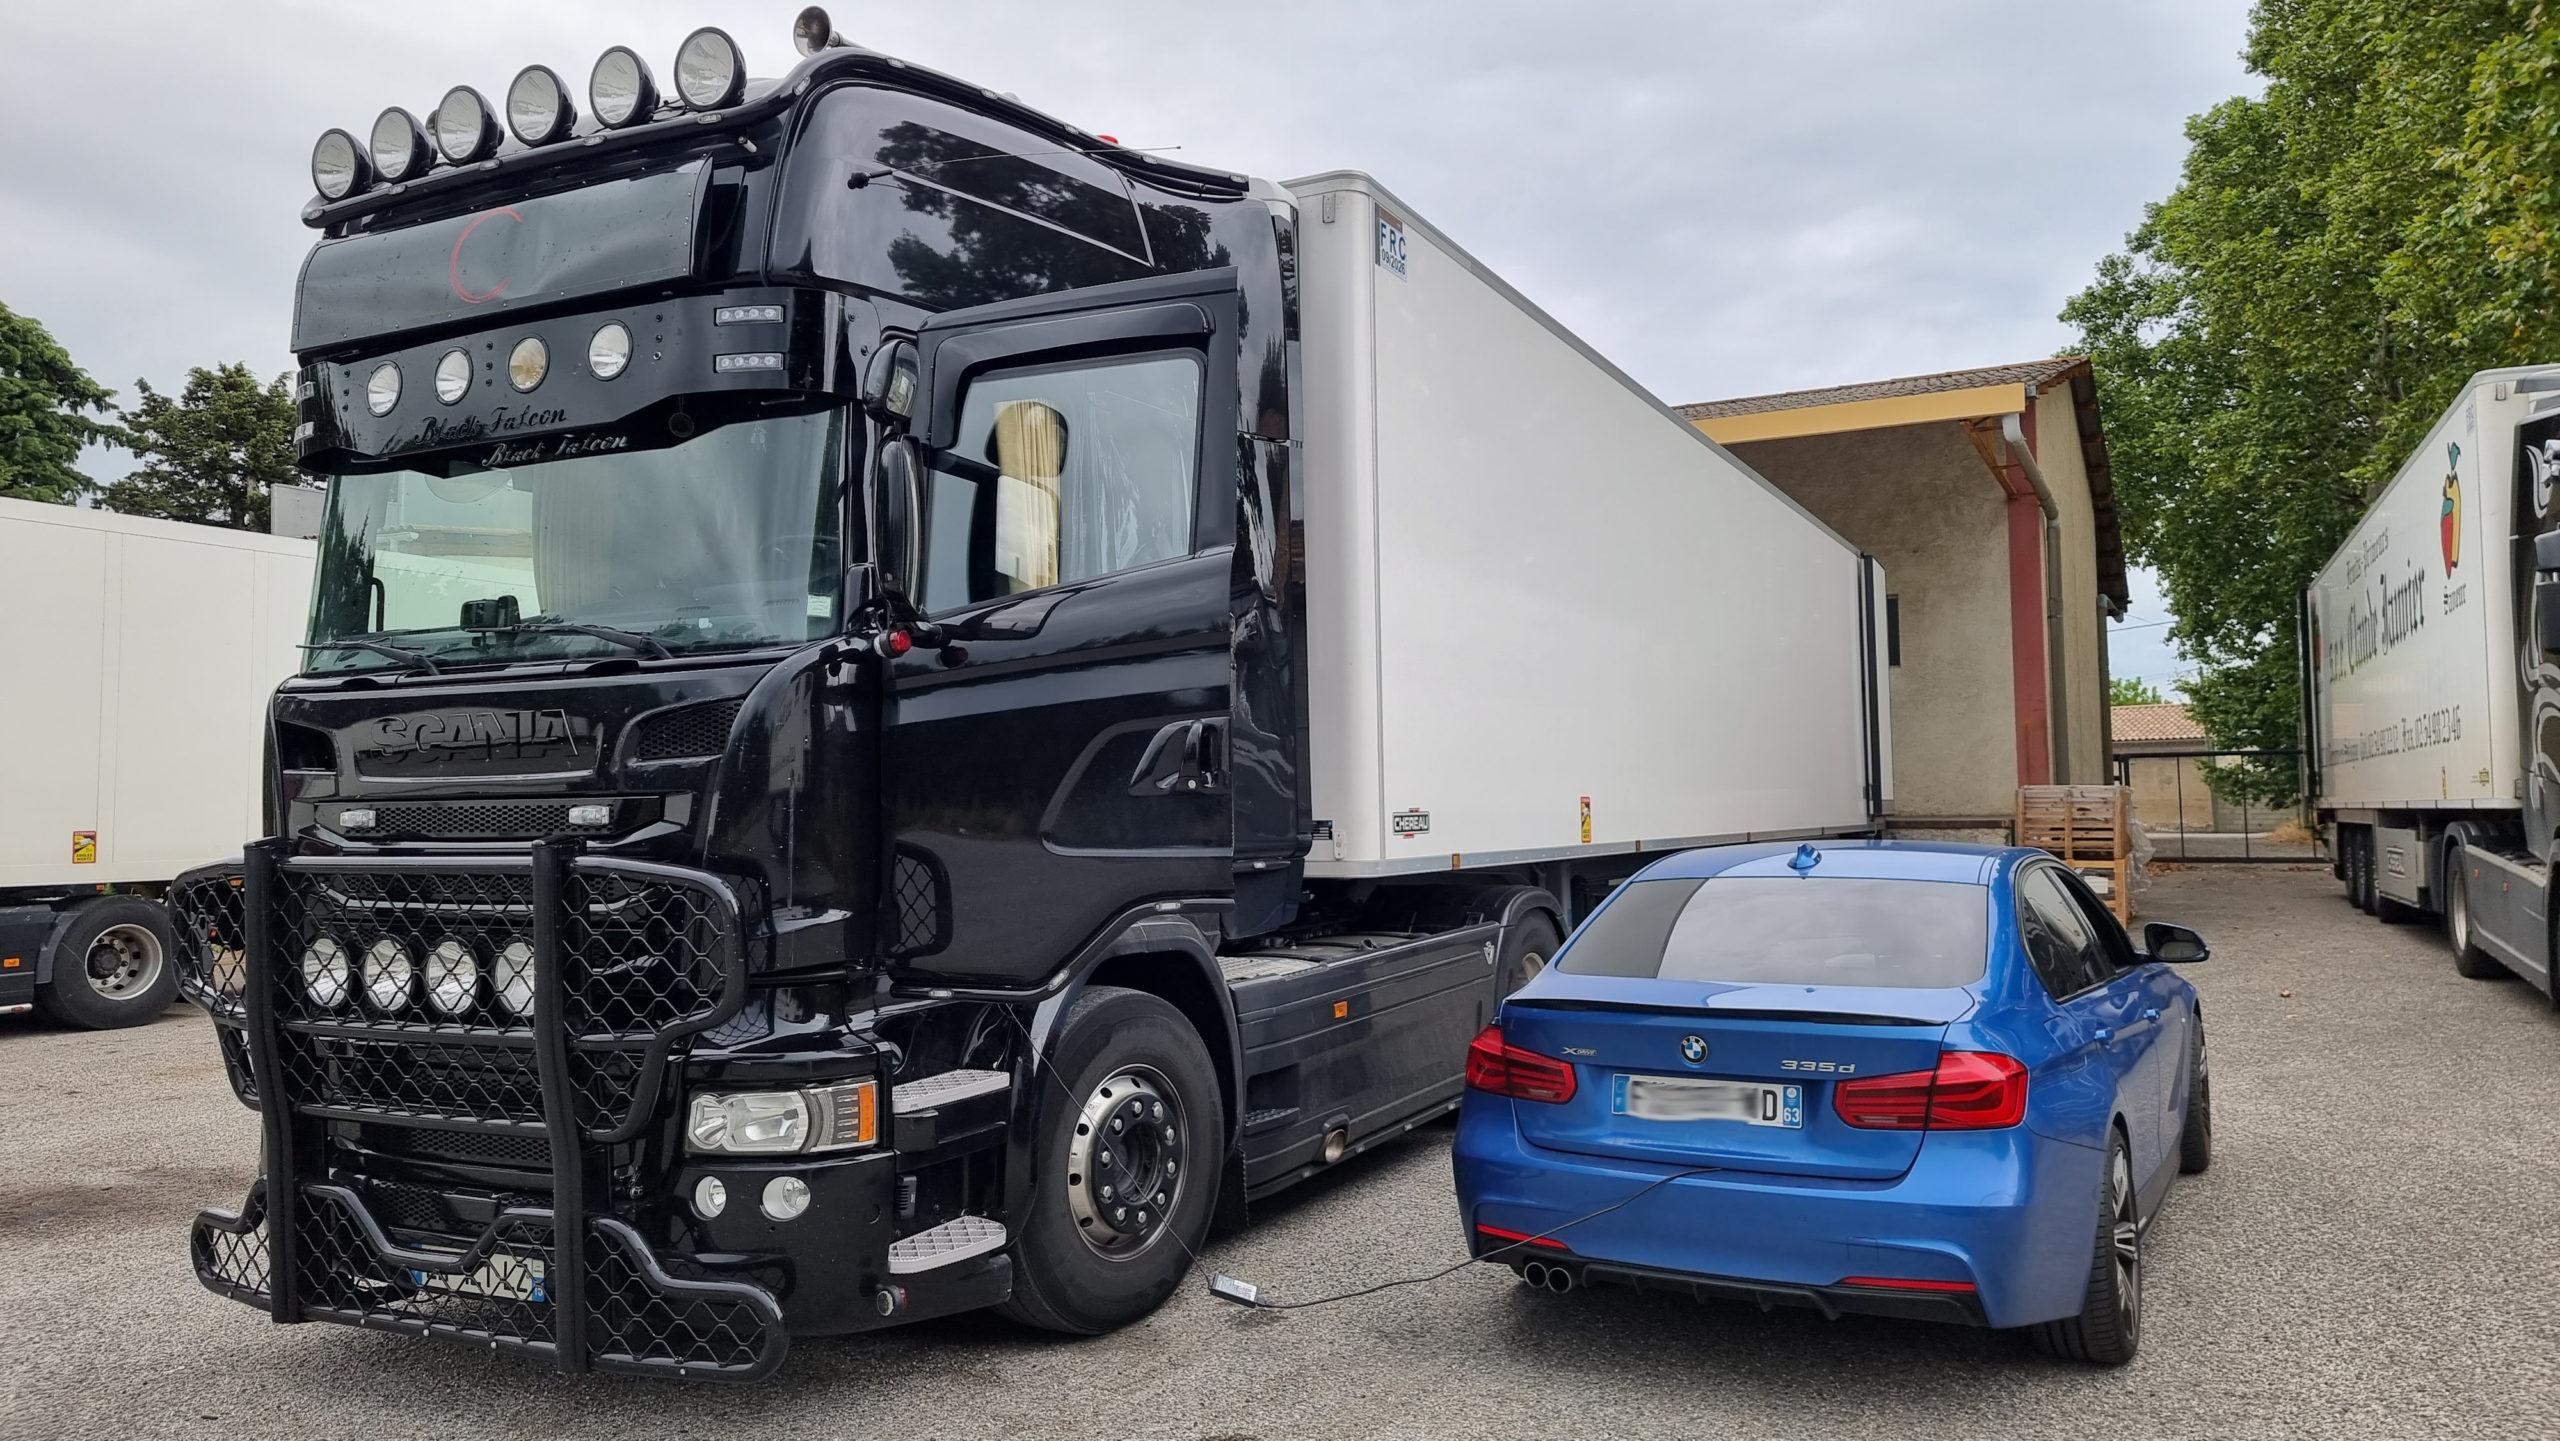 Suppression AdBlue Scania R580 Euro 6 et Echappement libre